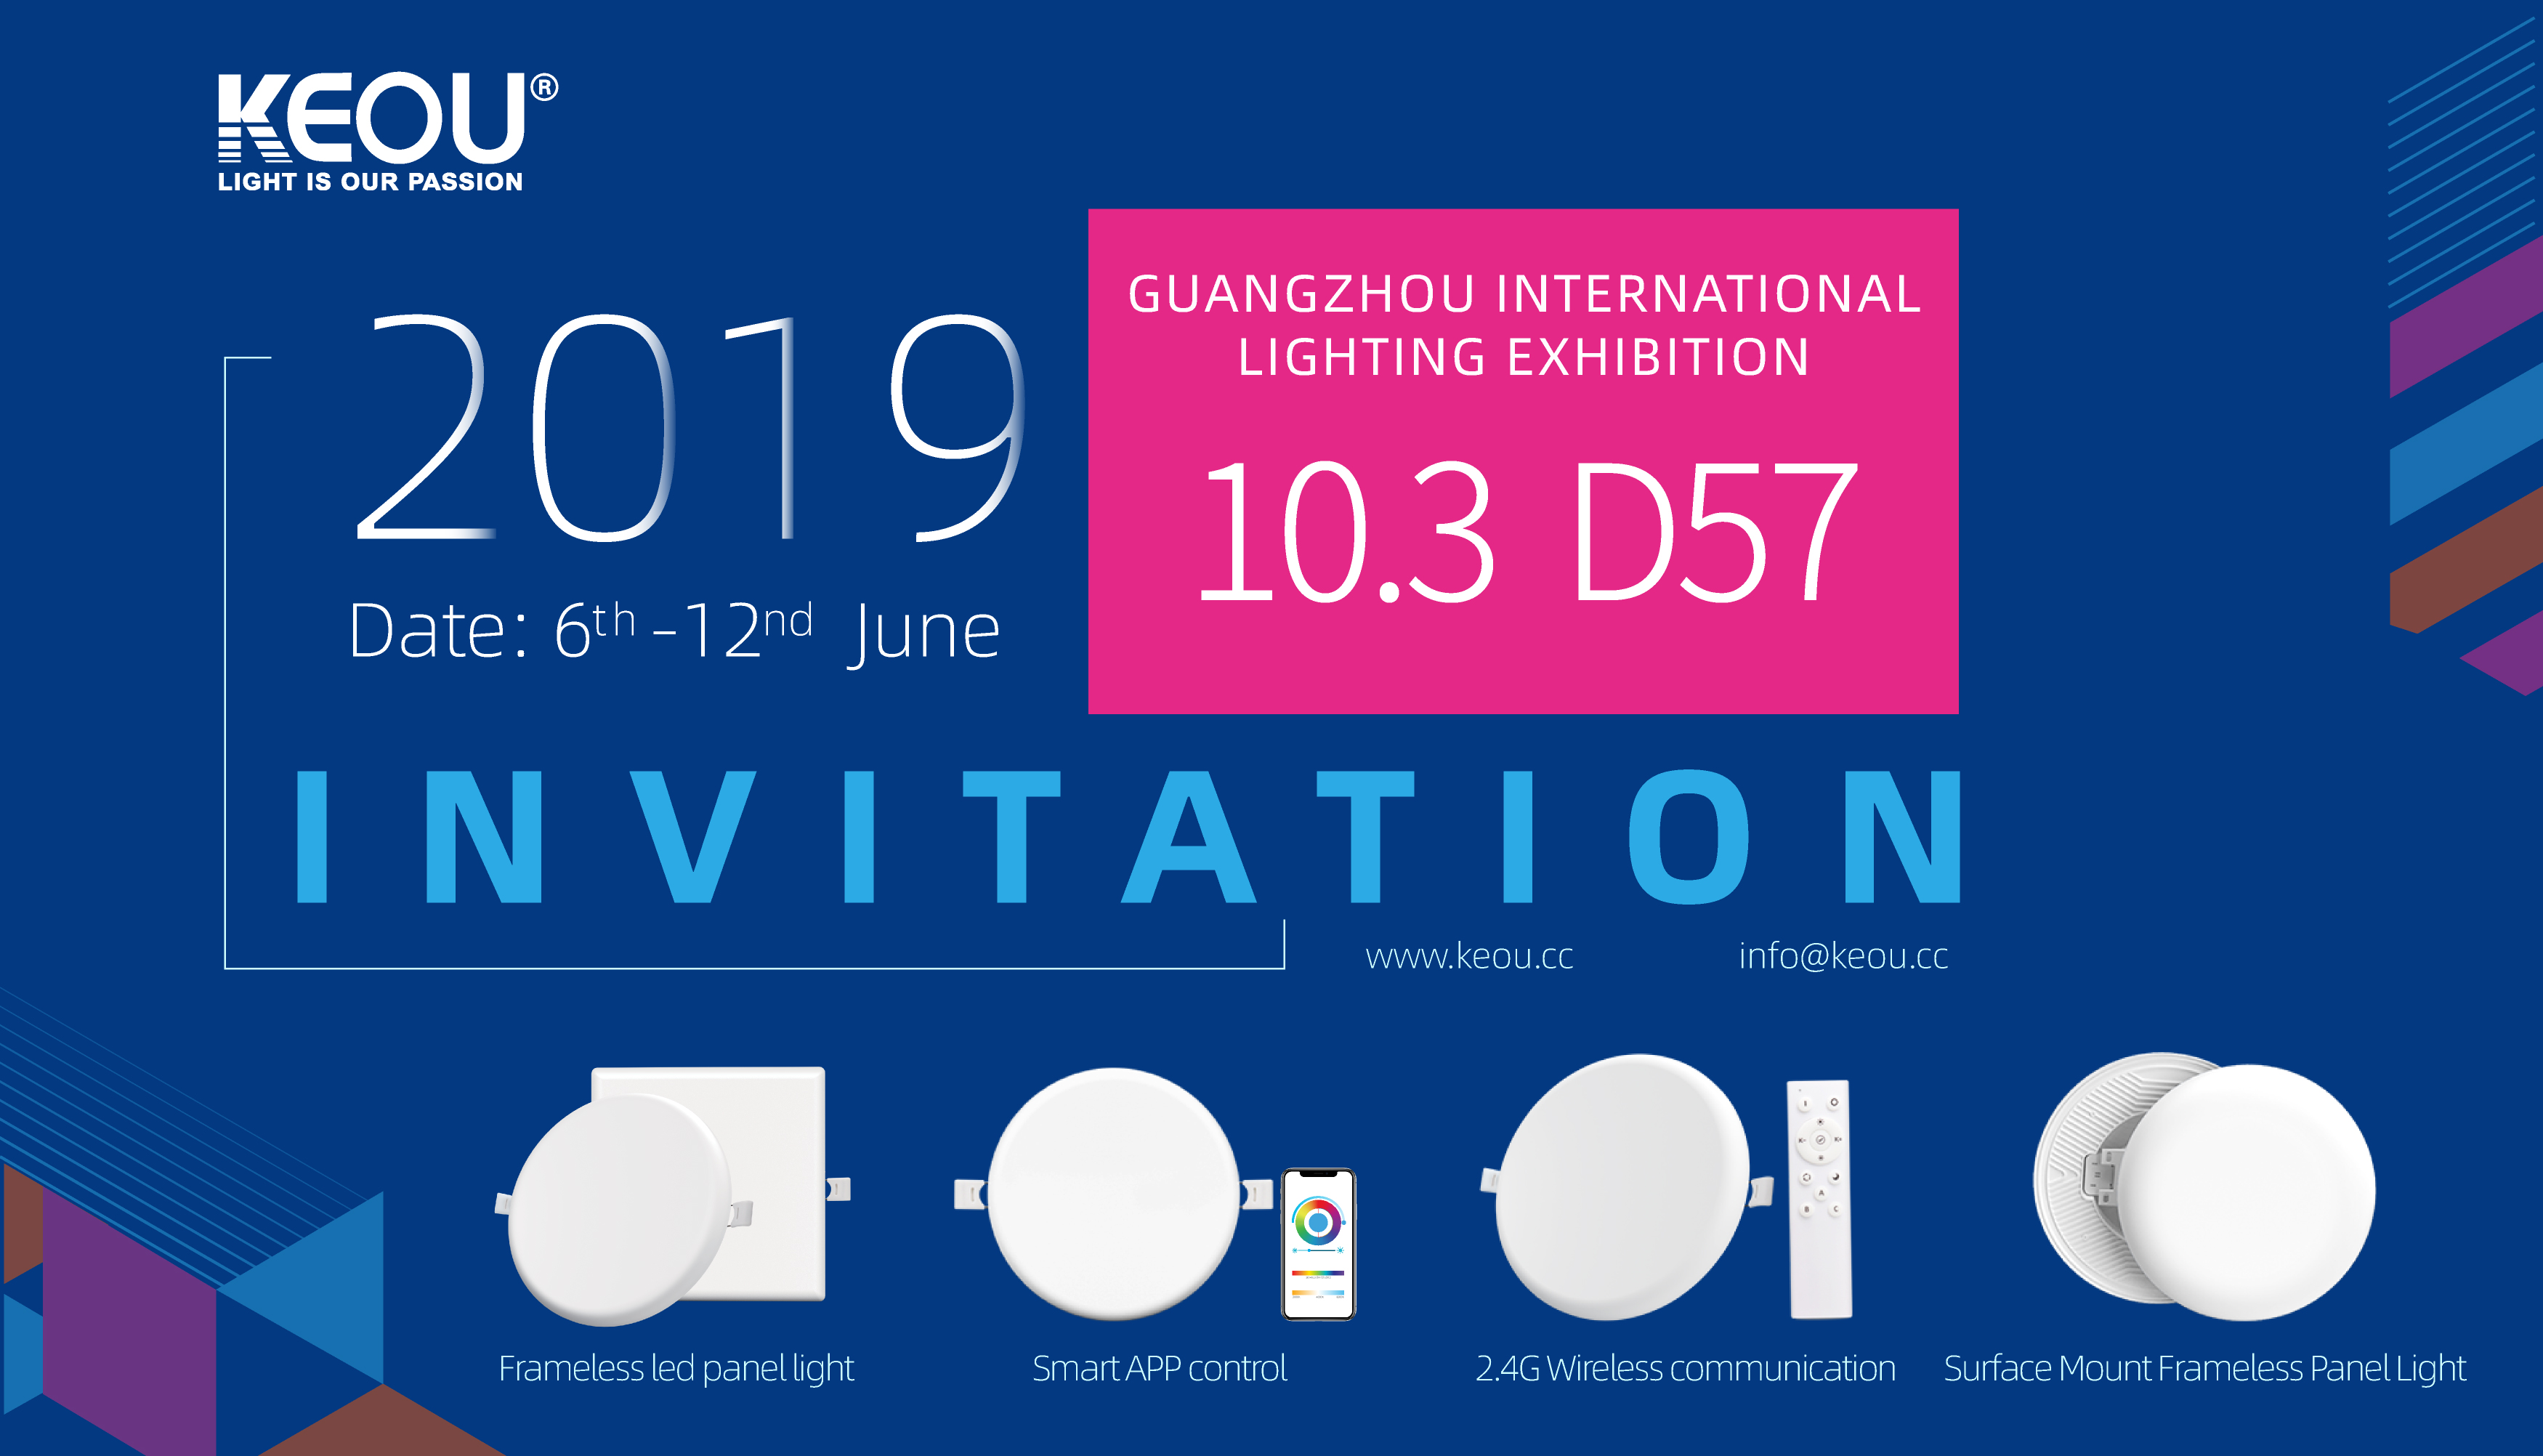 Led Panel Wholesale KEOU- Guangzhou International Lighting Exhibition